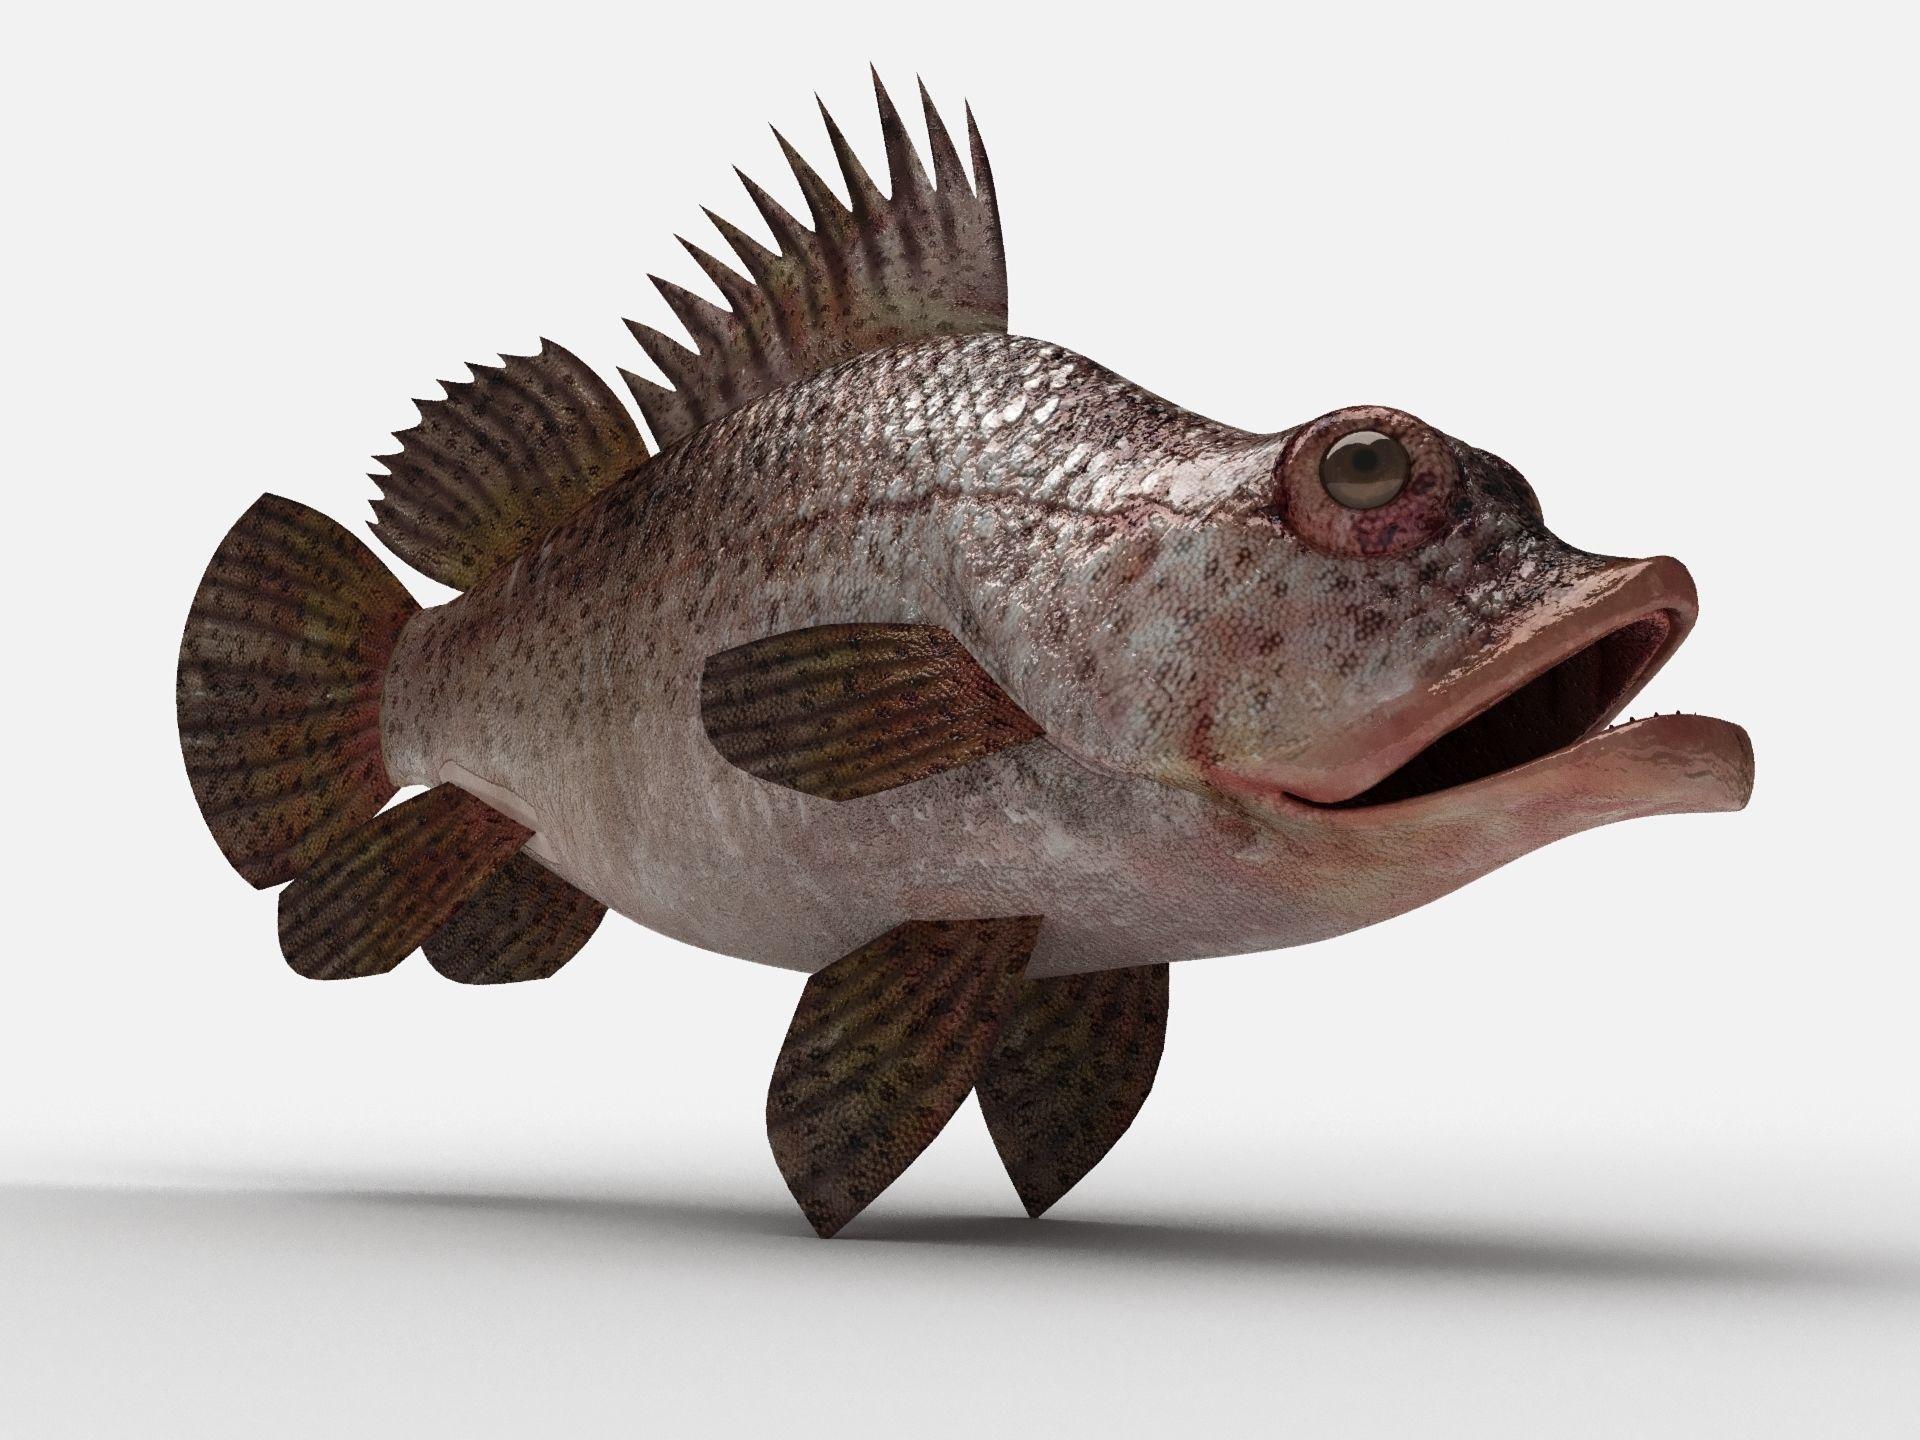 Scorpion fish Scorpen-2